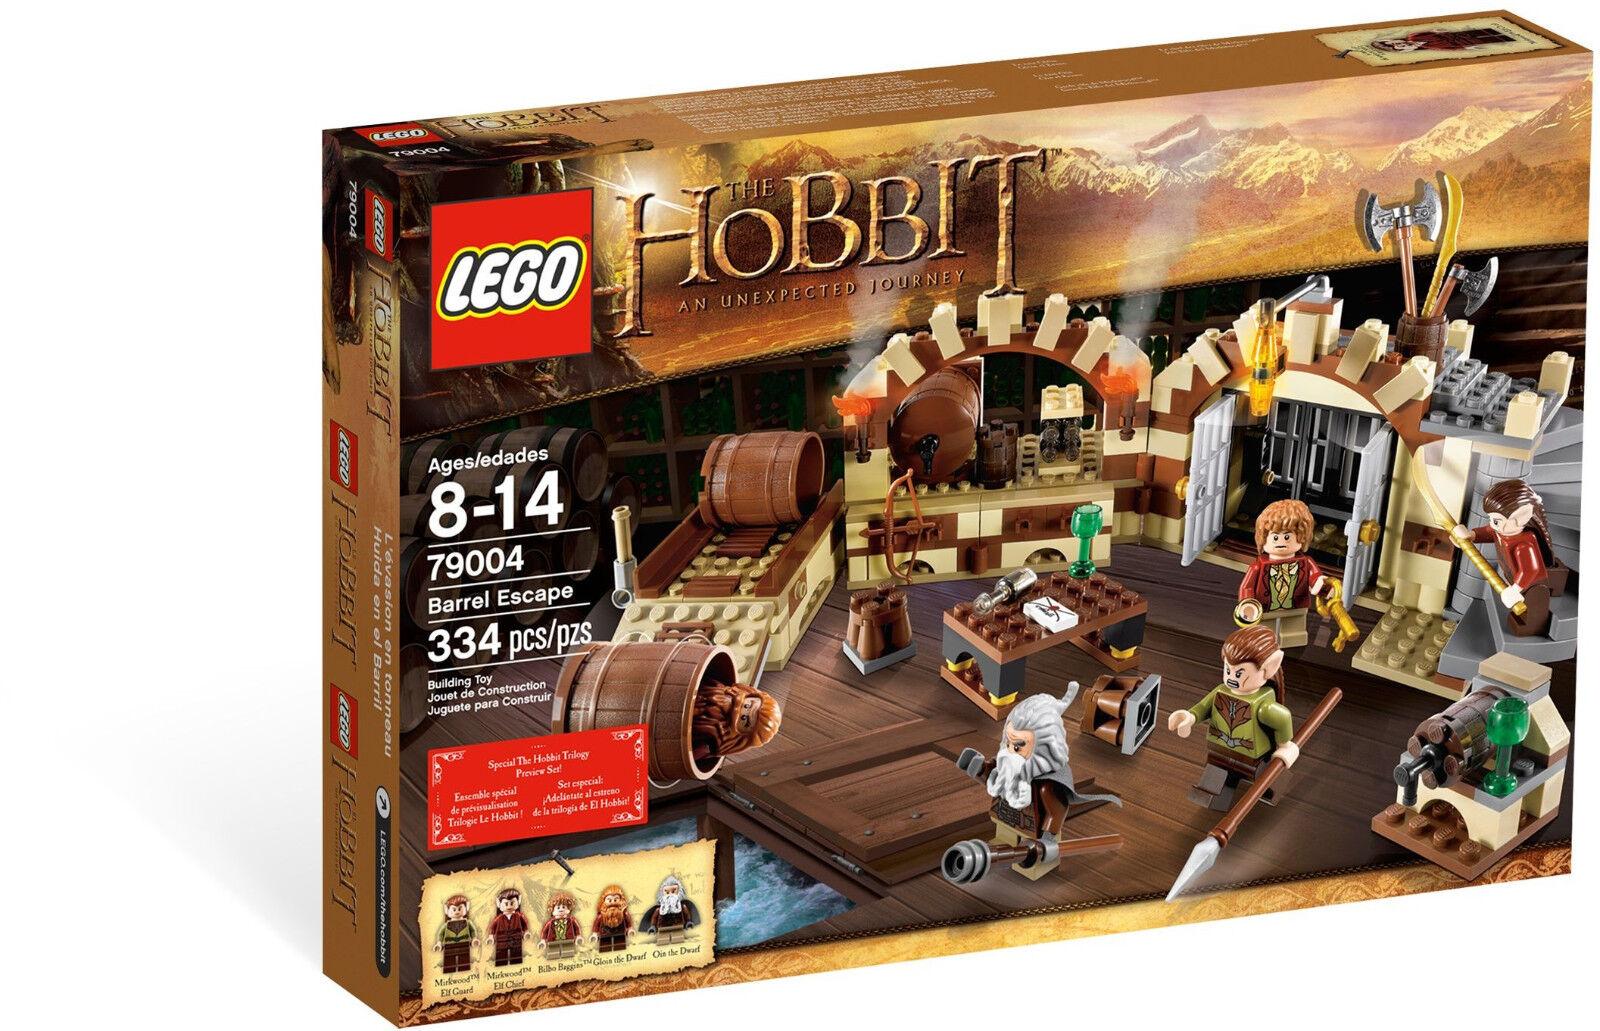 LEGO Hobbit 79004 - Die große Flucht   Barrel Escape - Oin Gloin LotR NEU NEW